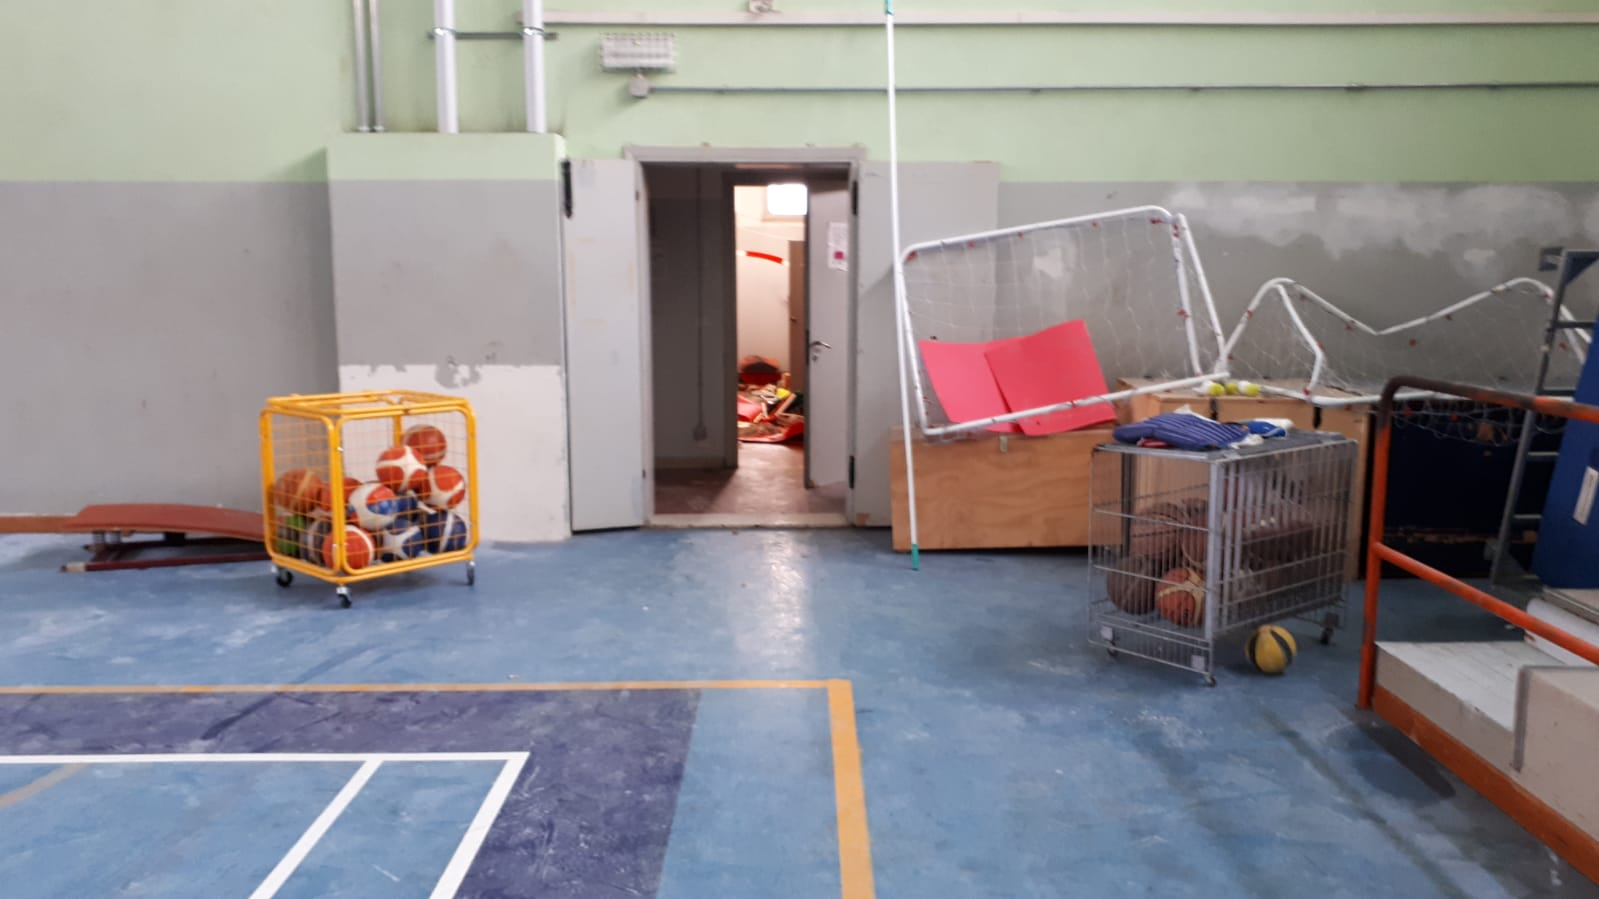 Vandali a San Bonifacio: colpita la palestra del Dal Cero